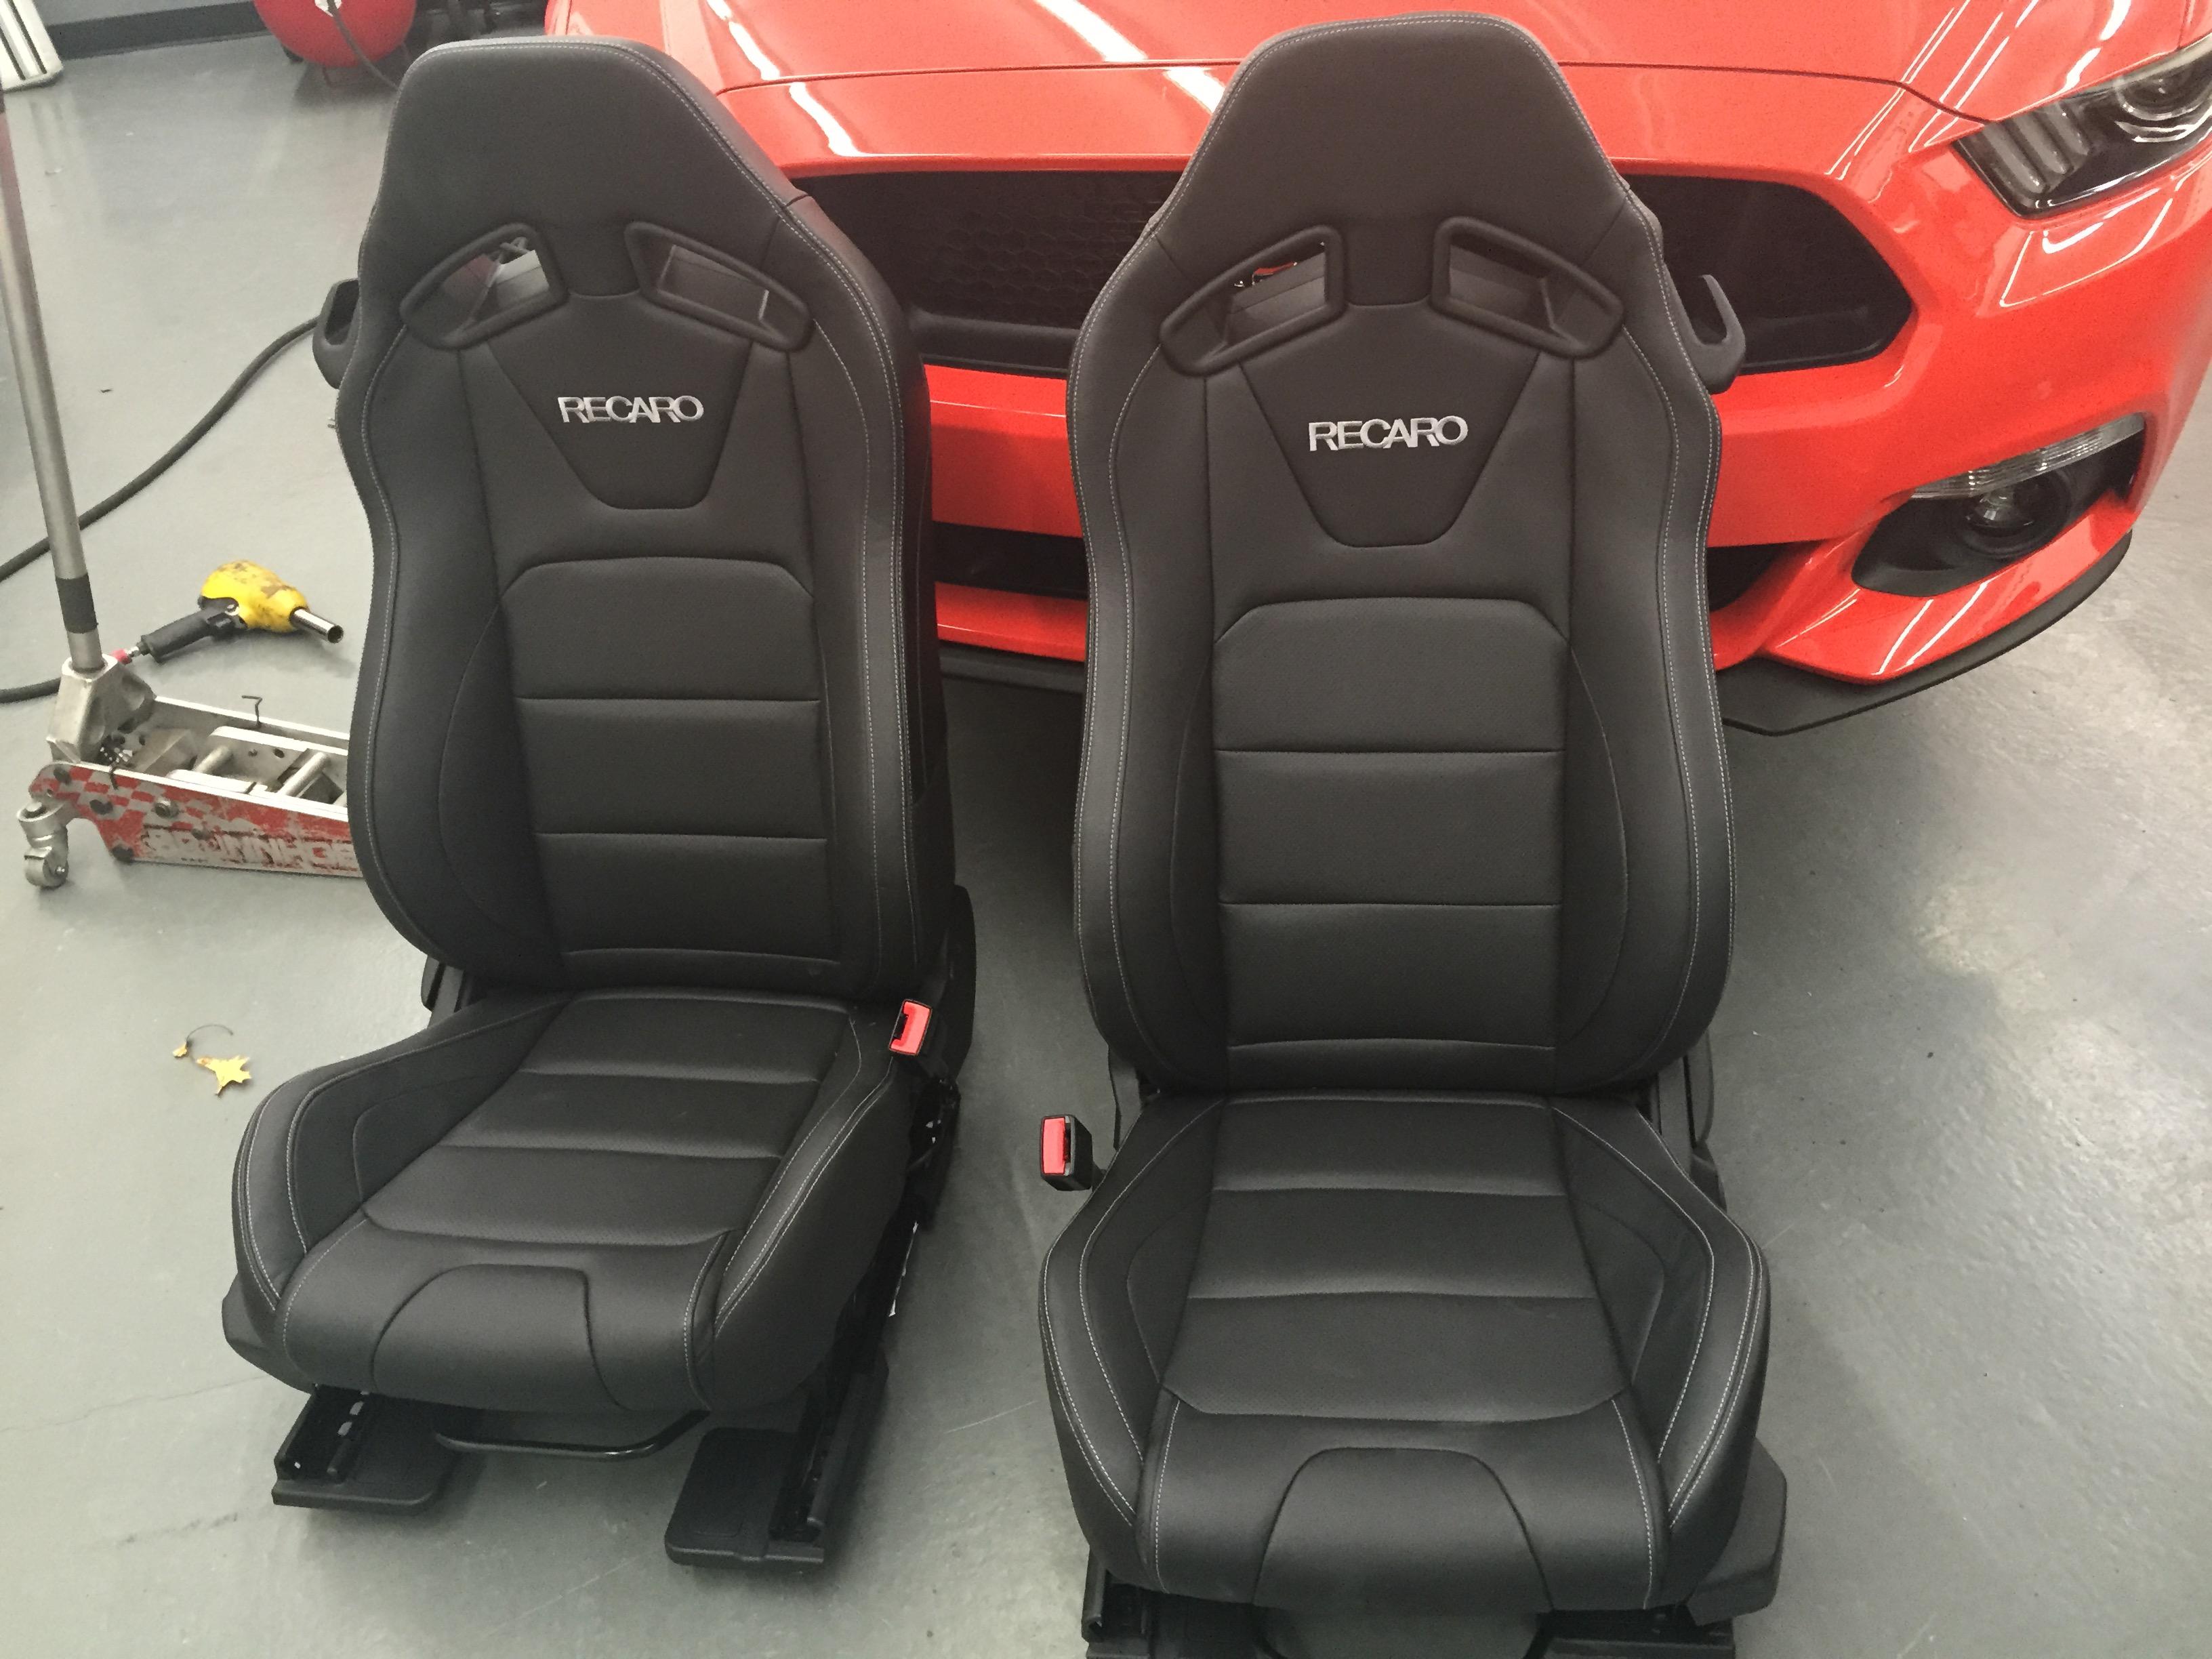 2015 Recaro Leather Seats For Sale Svtperformance Com